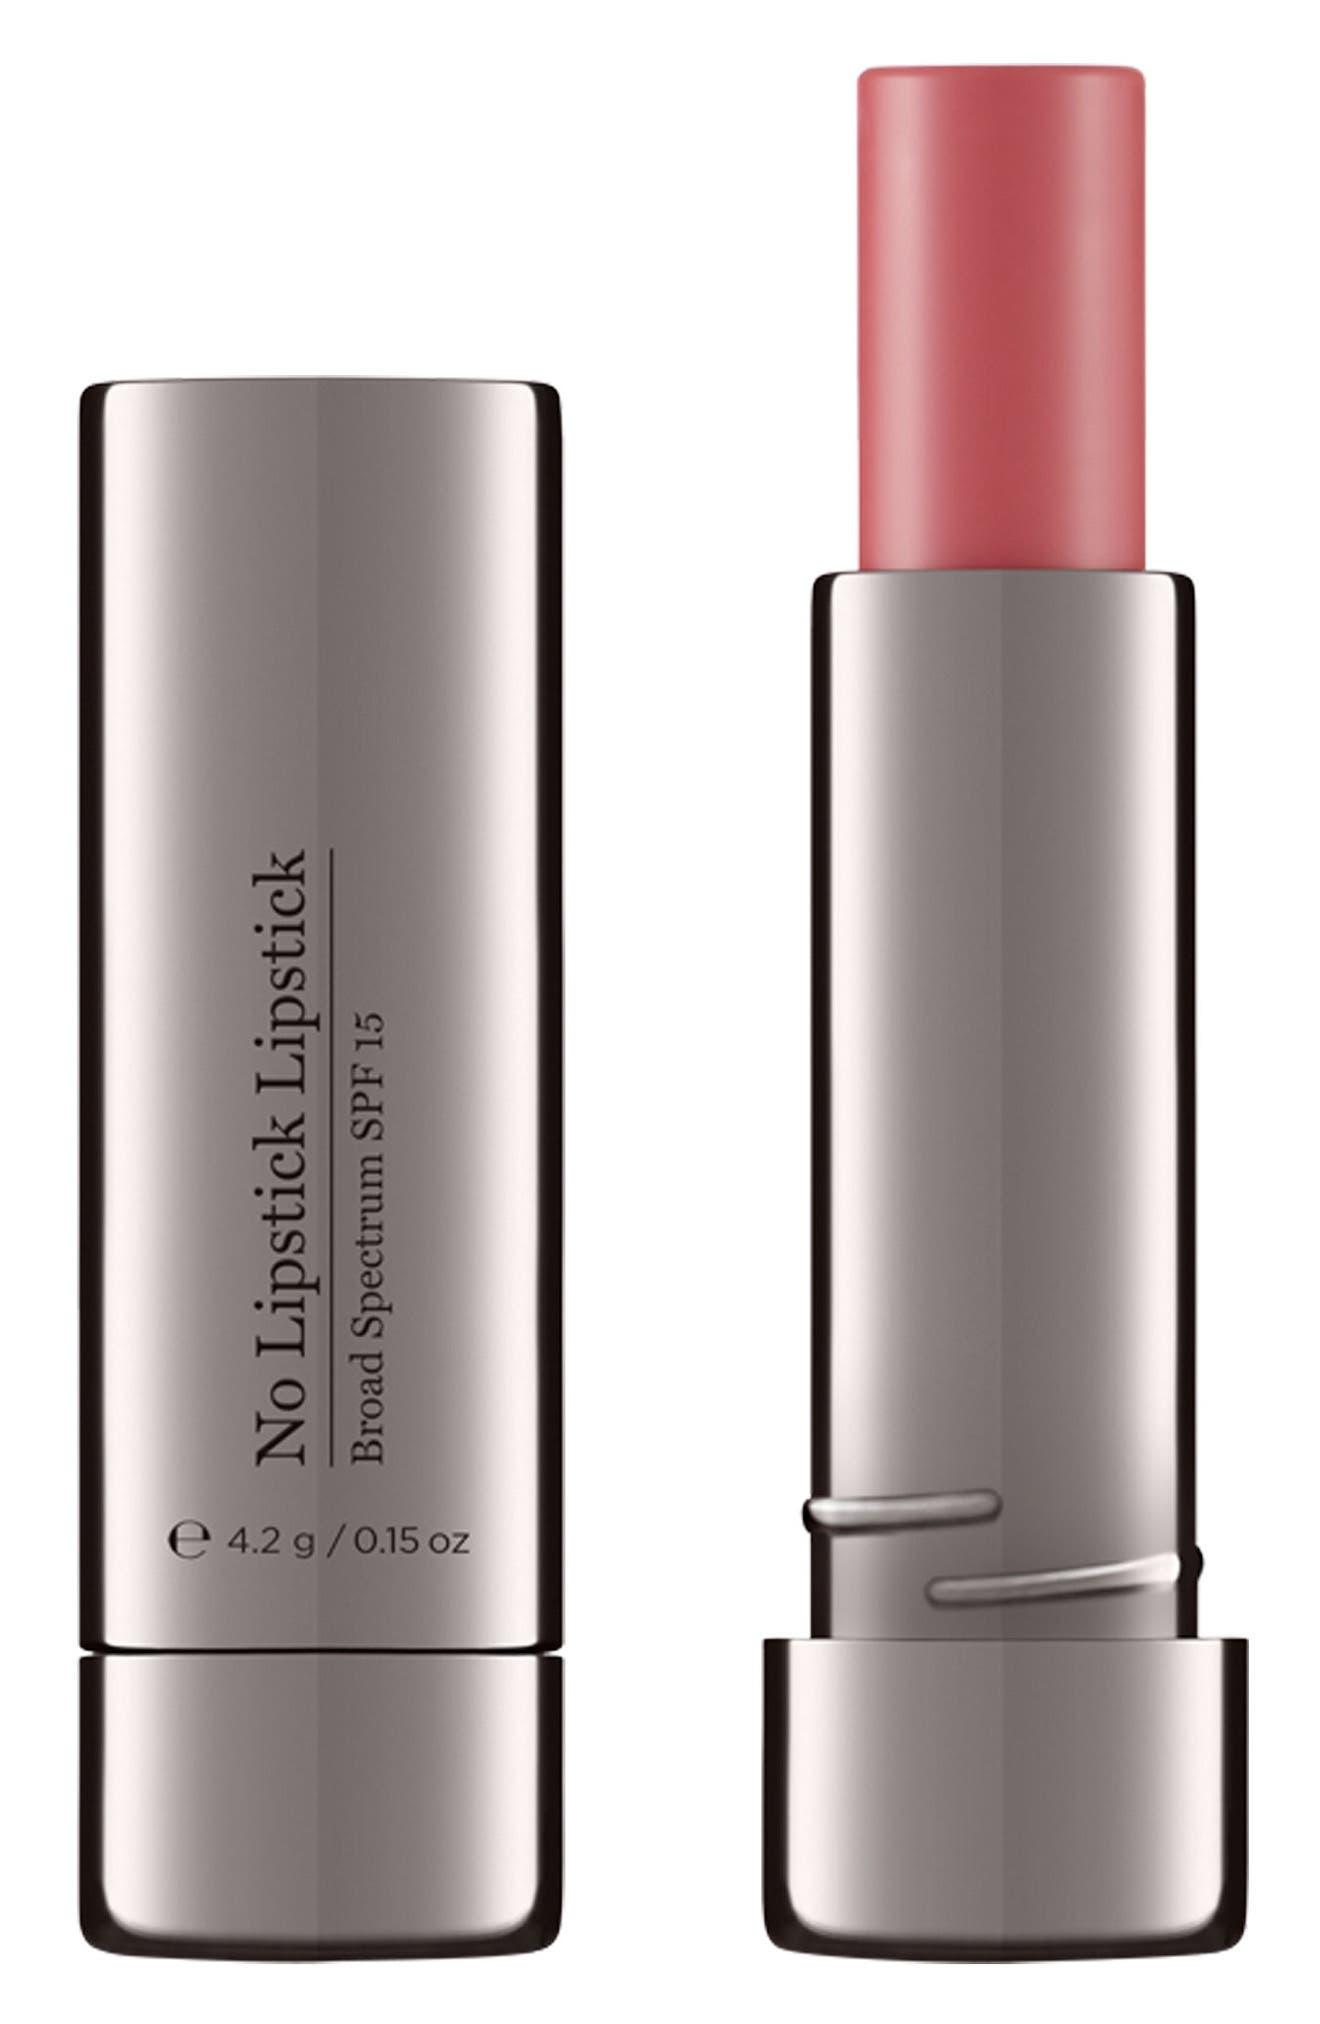 Alternate Image 1 Selected - Perricone MD No Lipstick Lipstick SPF 15